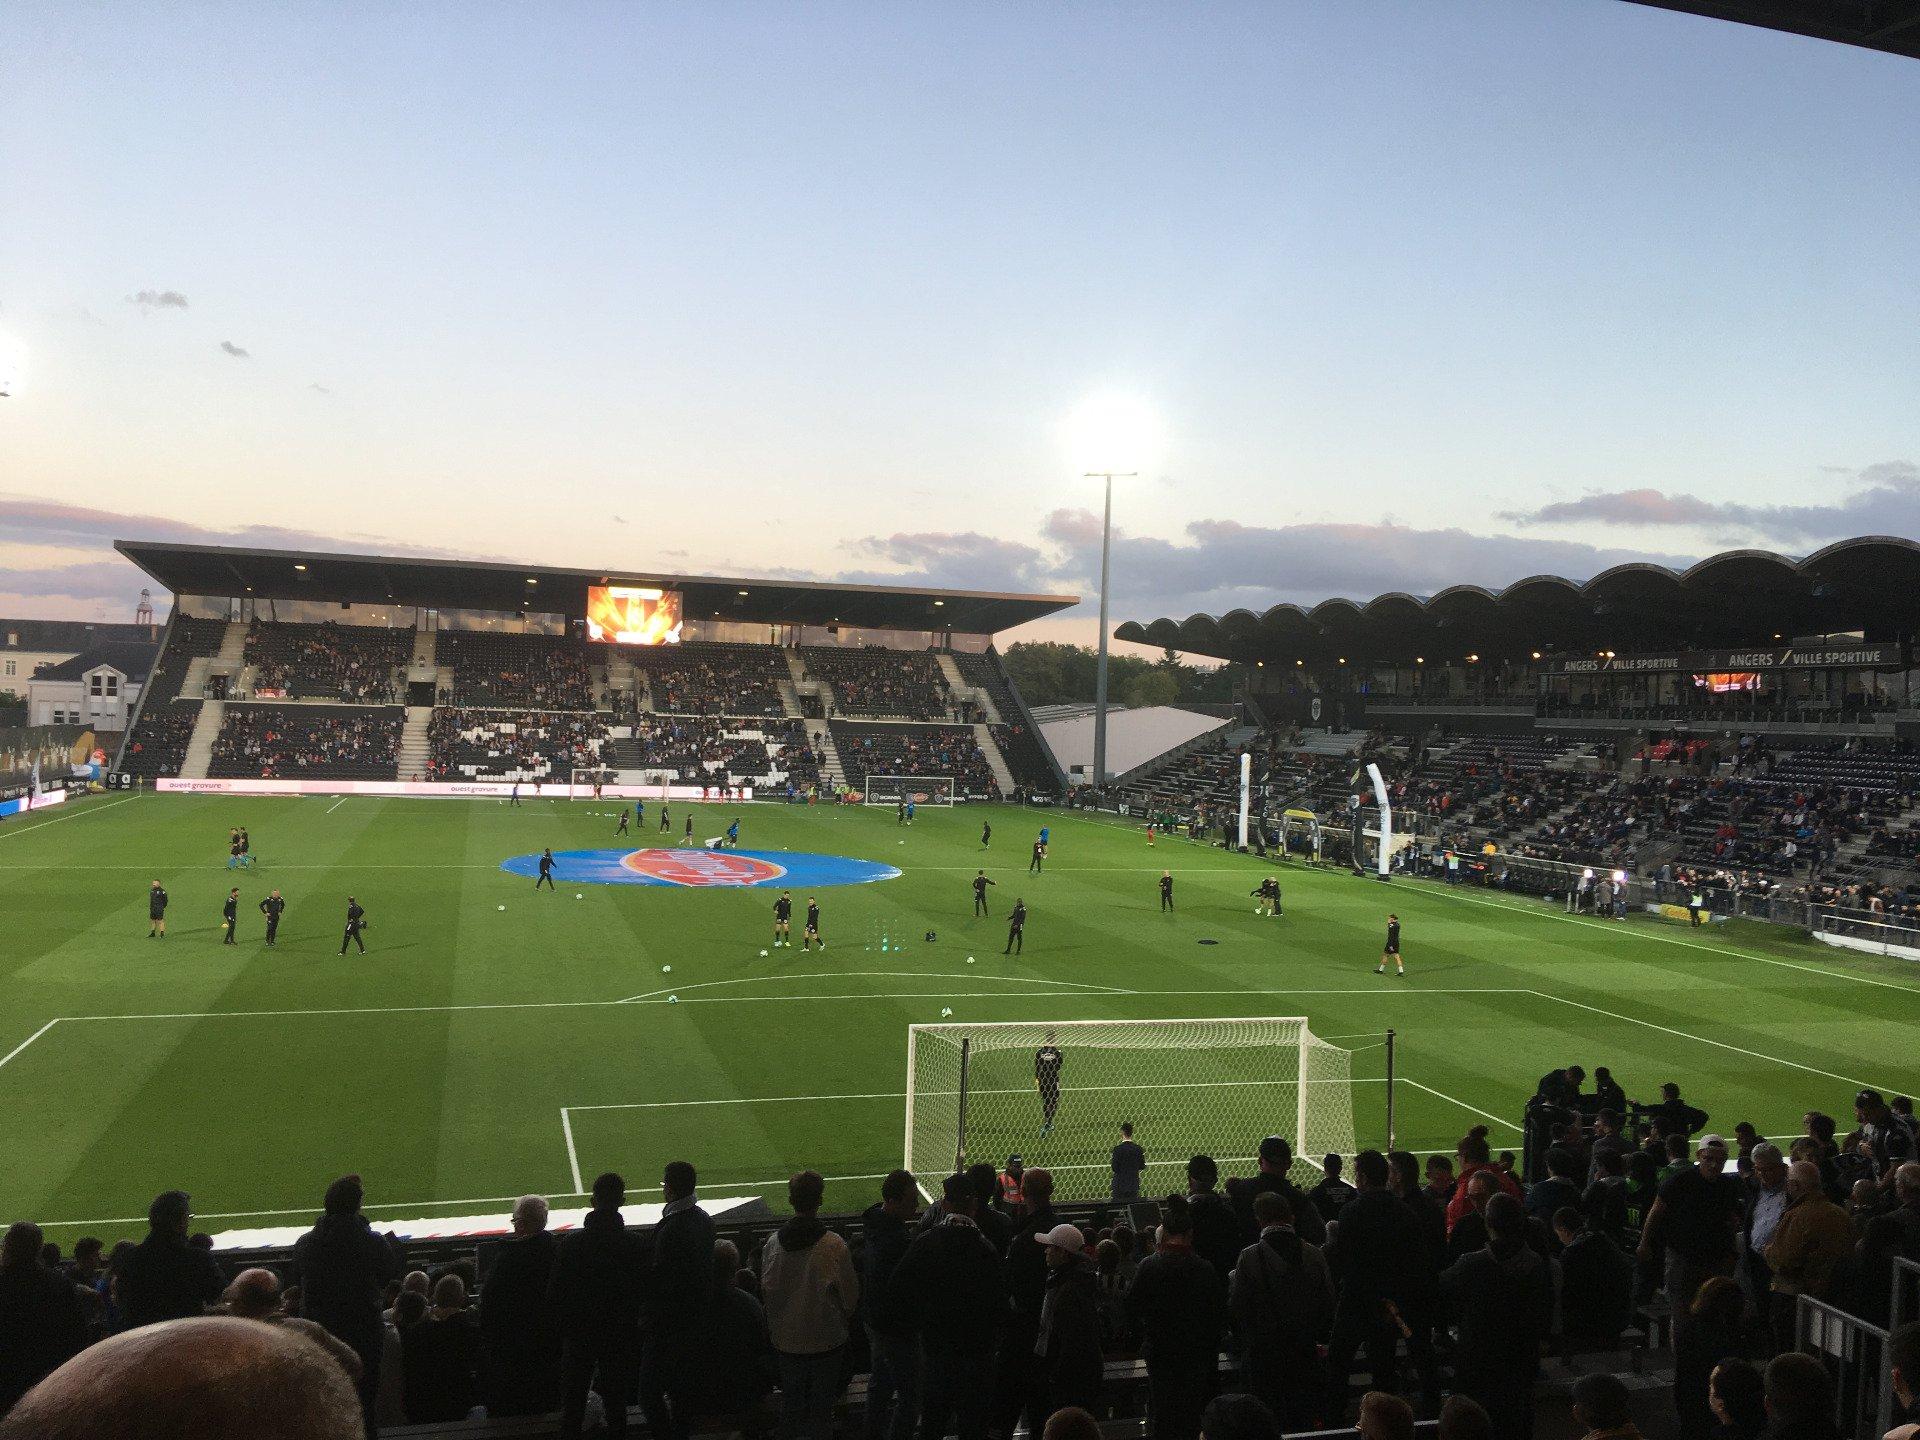 Stade Raymond Kopa Section Coubertin E Row U Seat 124